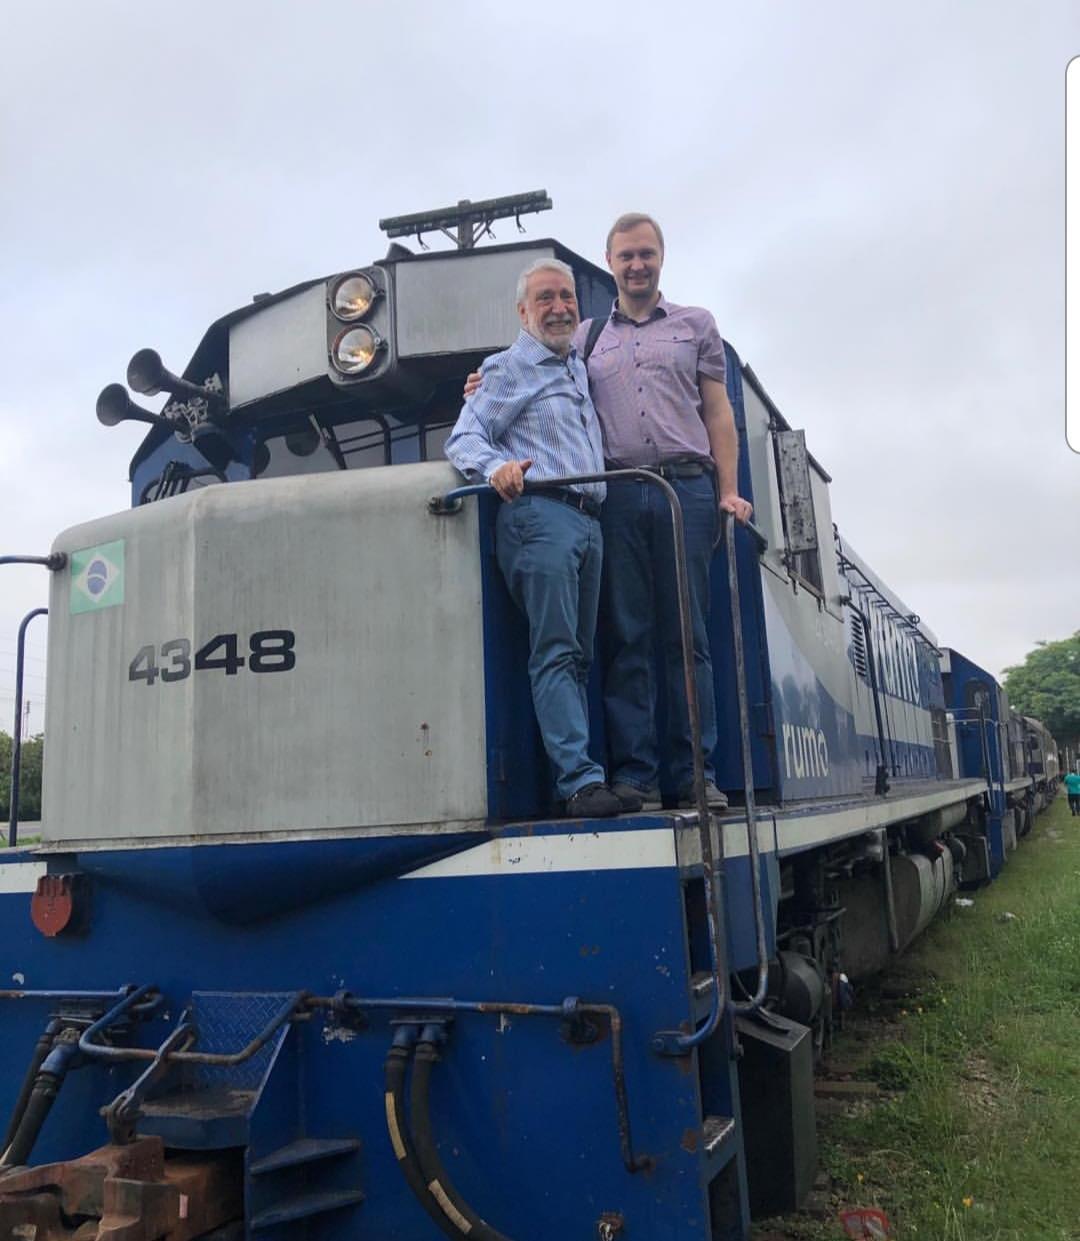 Diretor da Russian Railways visita trem no Brasil